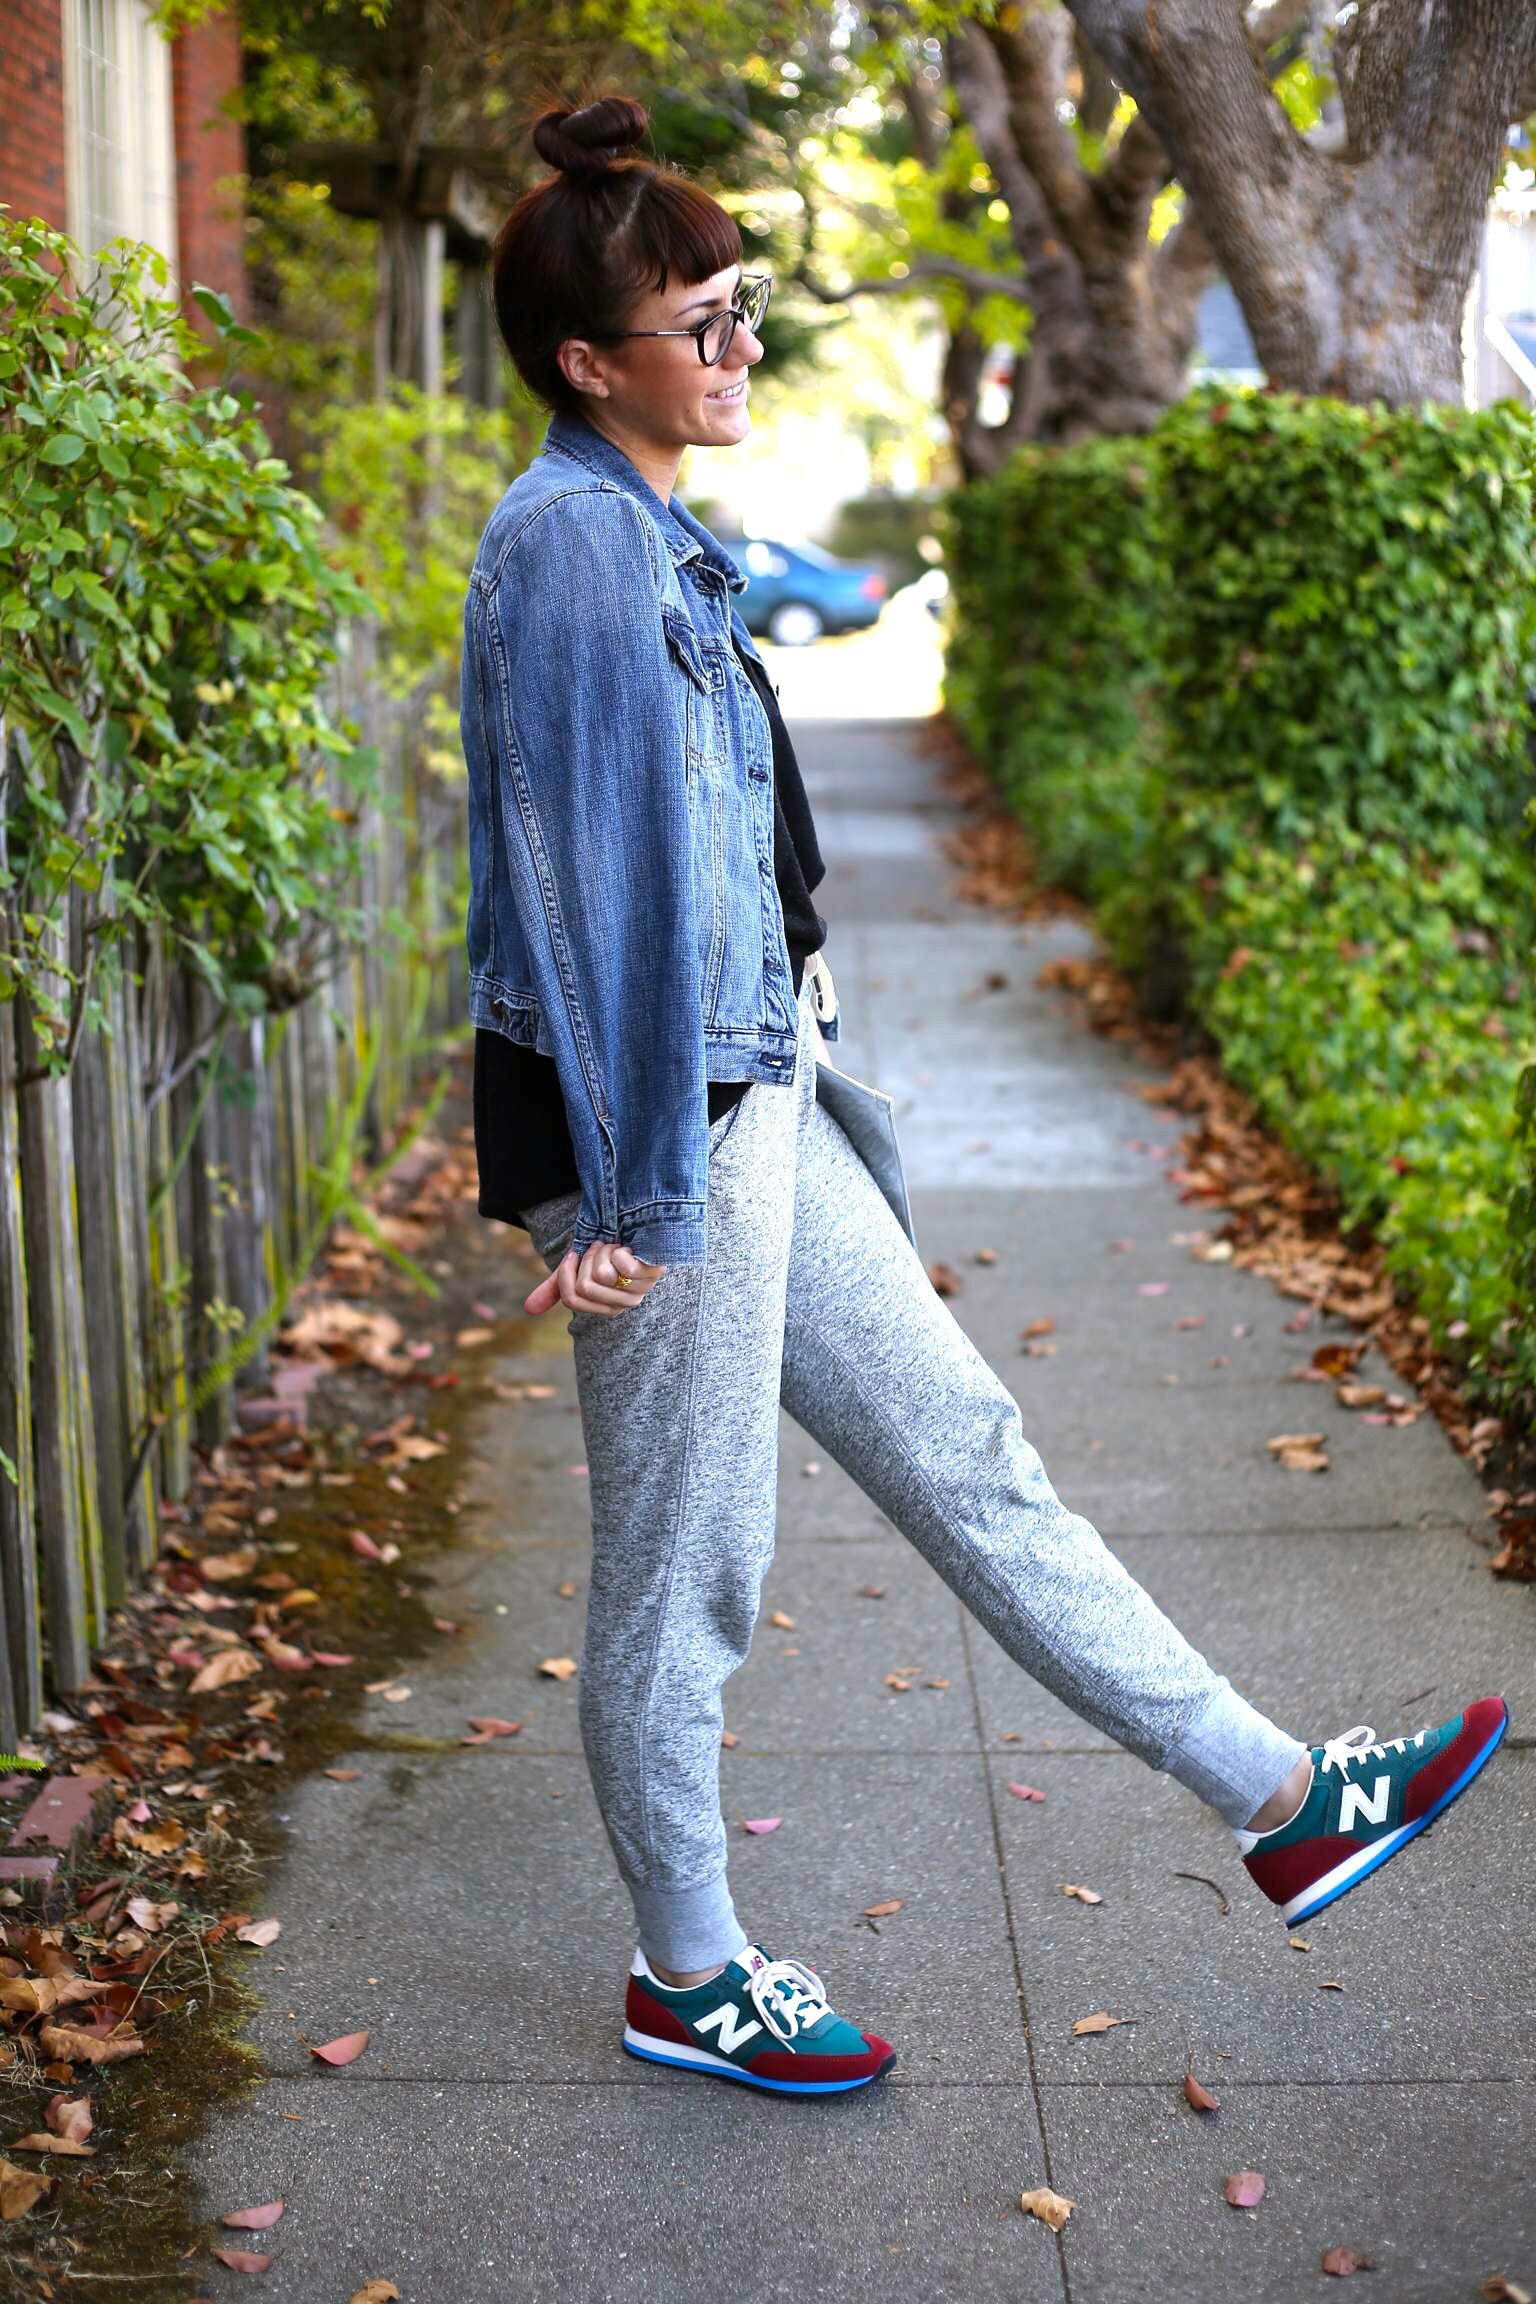 Sweater:  Jigsaw London  (Now on SUPER SALE); Jacket & Sweats: J.Crew; Sneakers:  New Balance, J.Crew ; Clutch: H&M